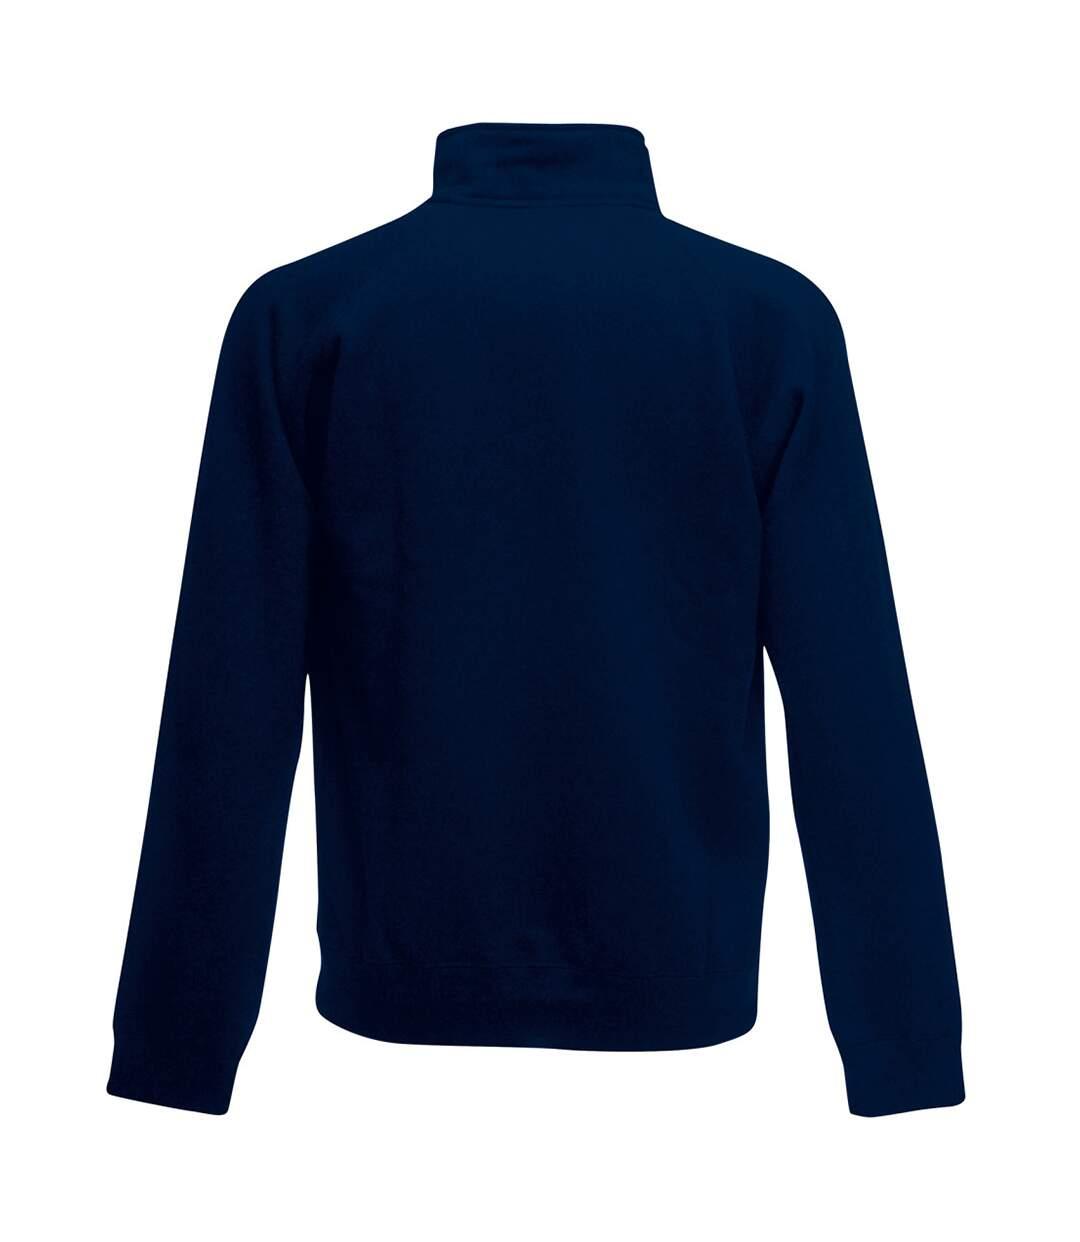 Fruit Of The Loom Mens Sweatshirt Jacket (Deep Navy) - UTBC1375